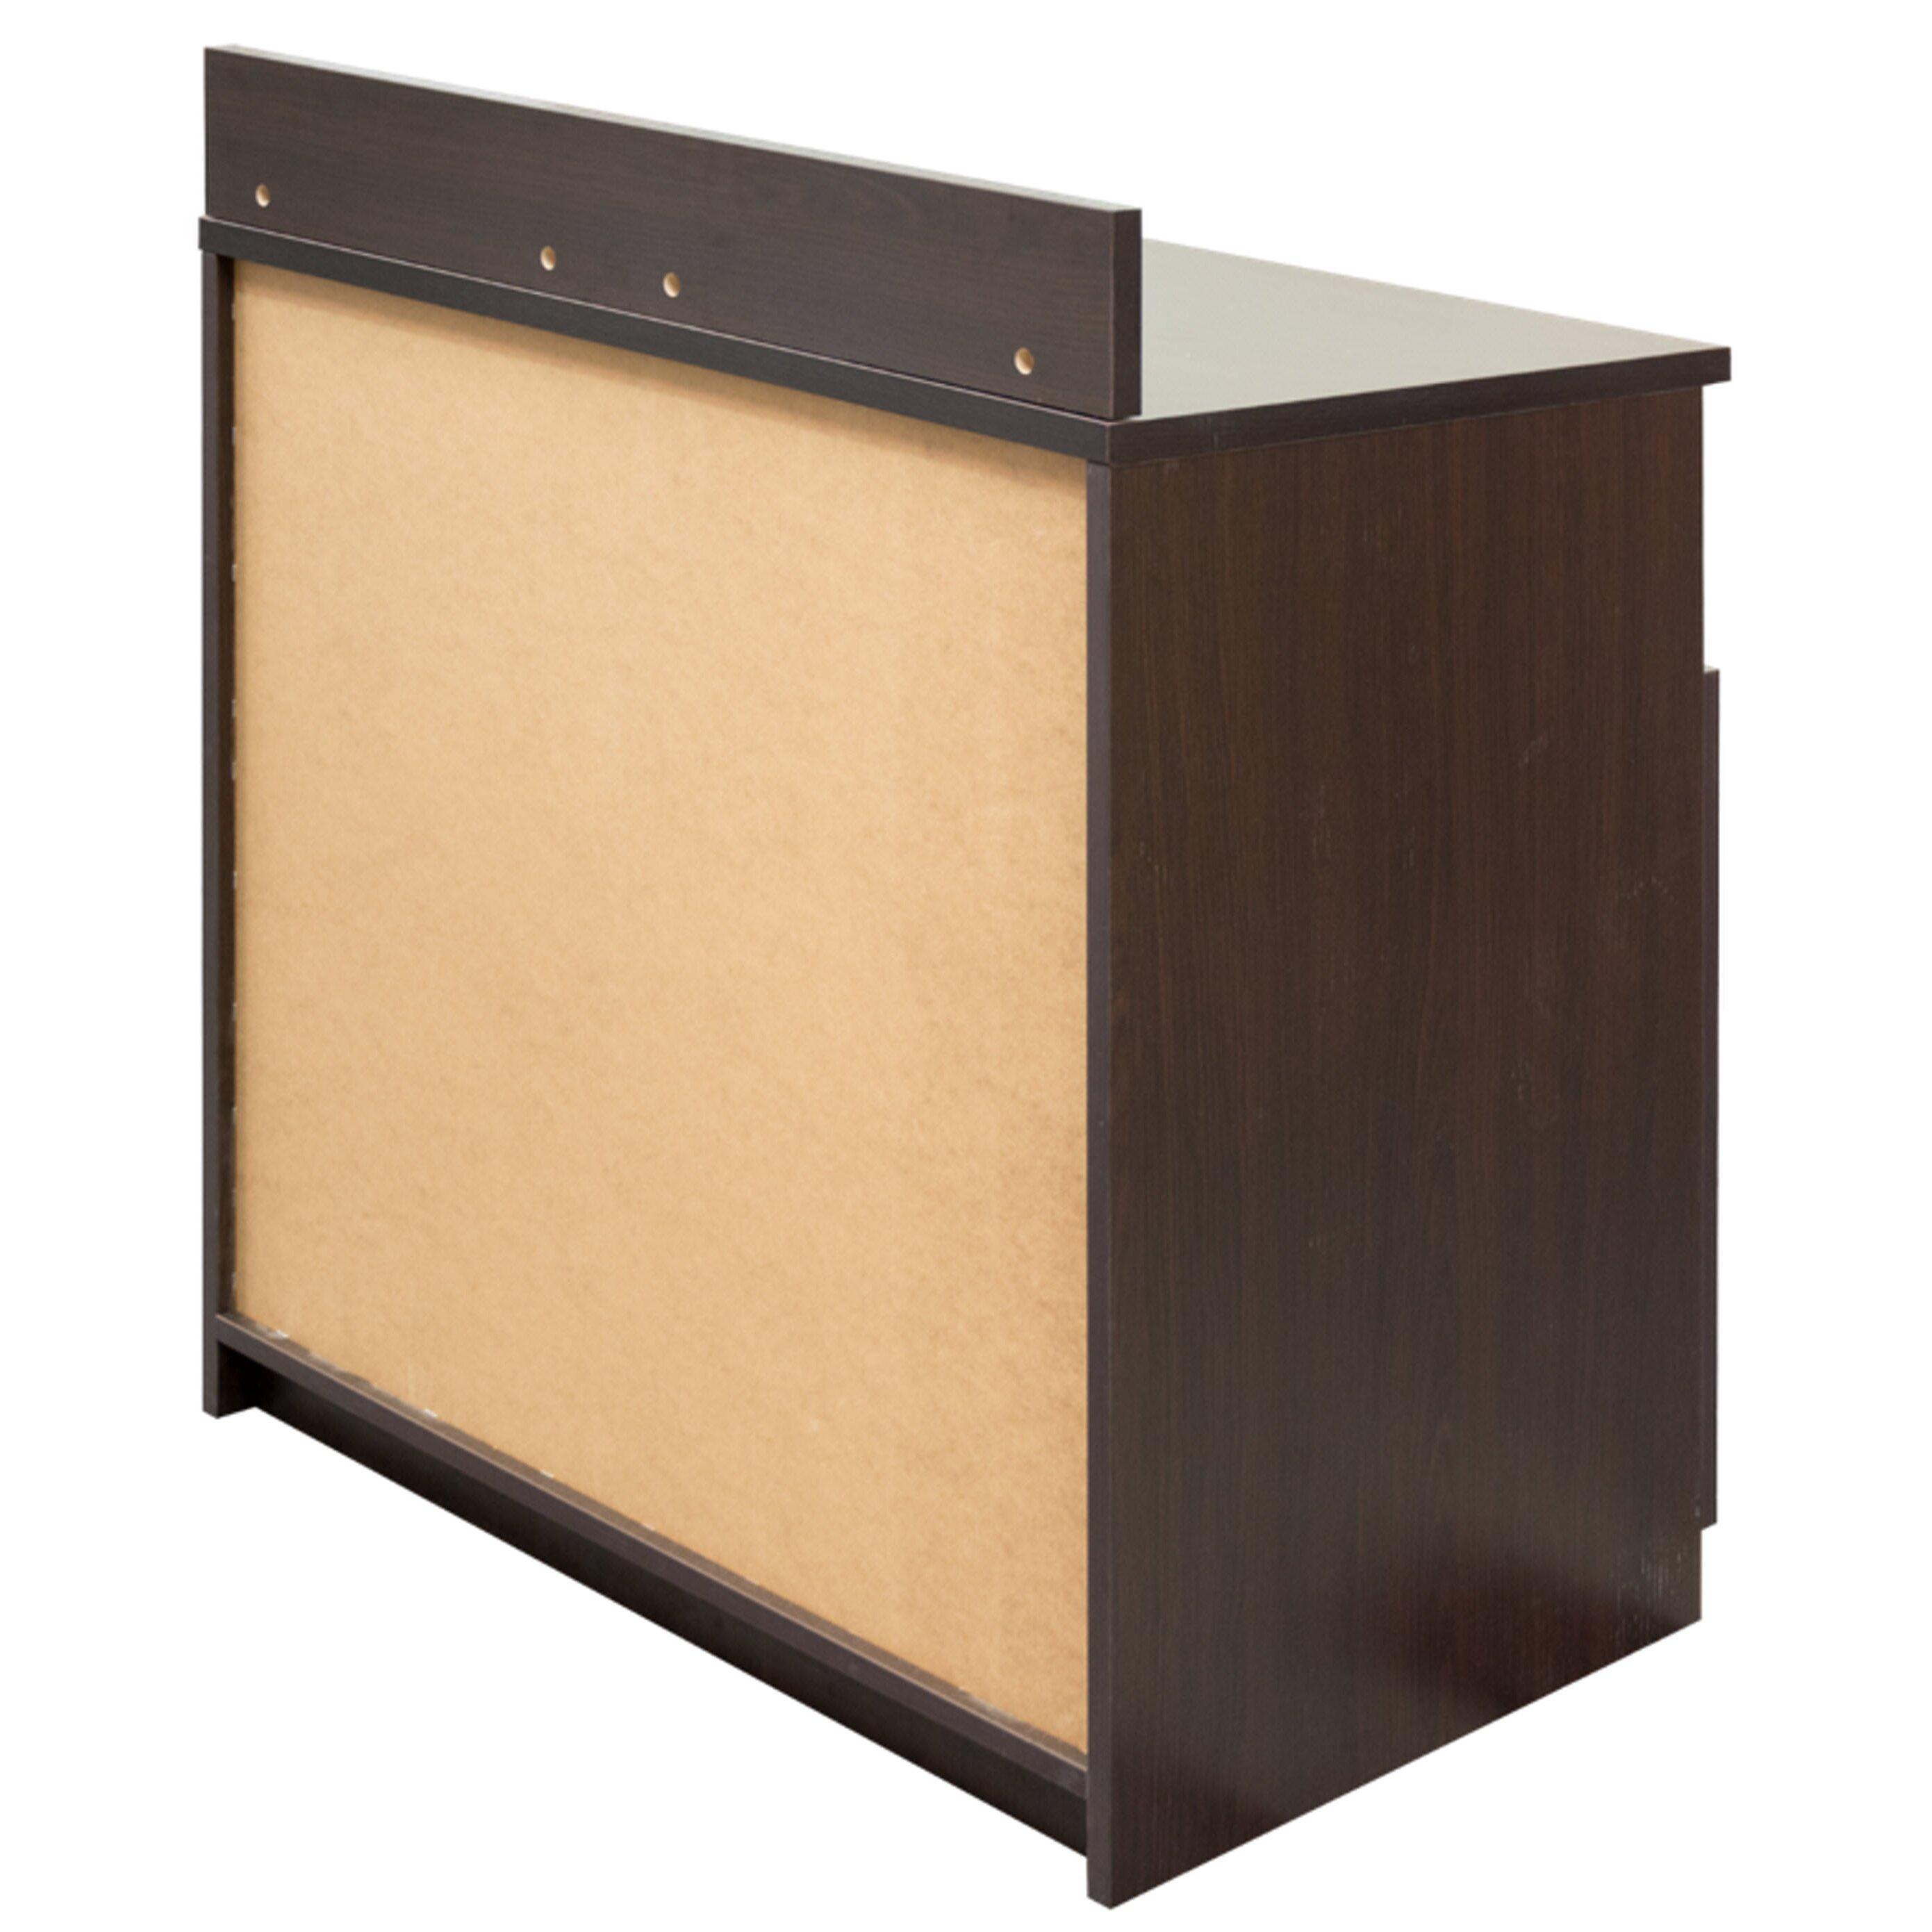 Breaktime 39 x 39 kitchen pantry cabinet wayfair for Wayfair kitchen cabinets